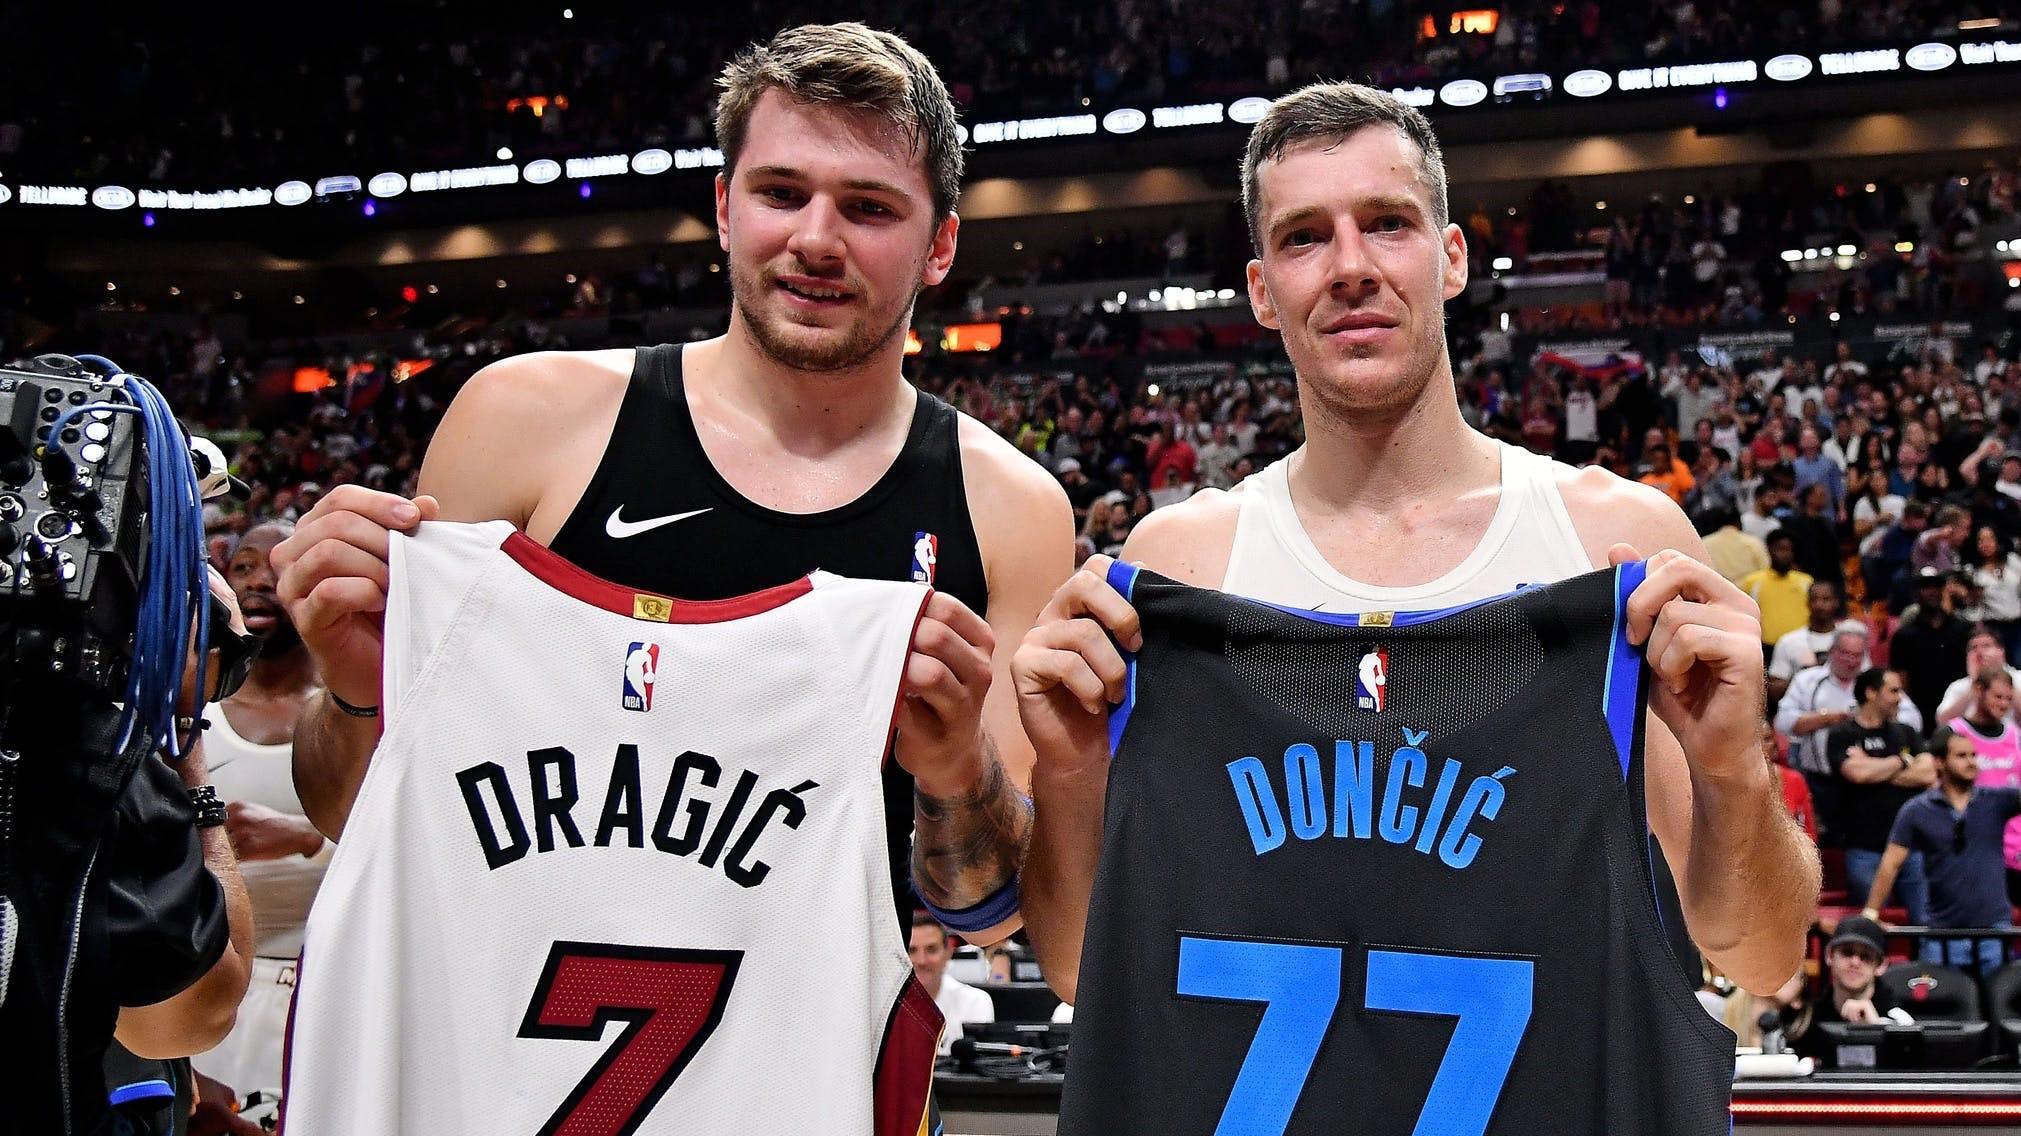 NBA Dallas Doncic Dragic